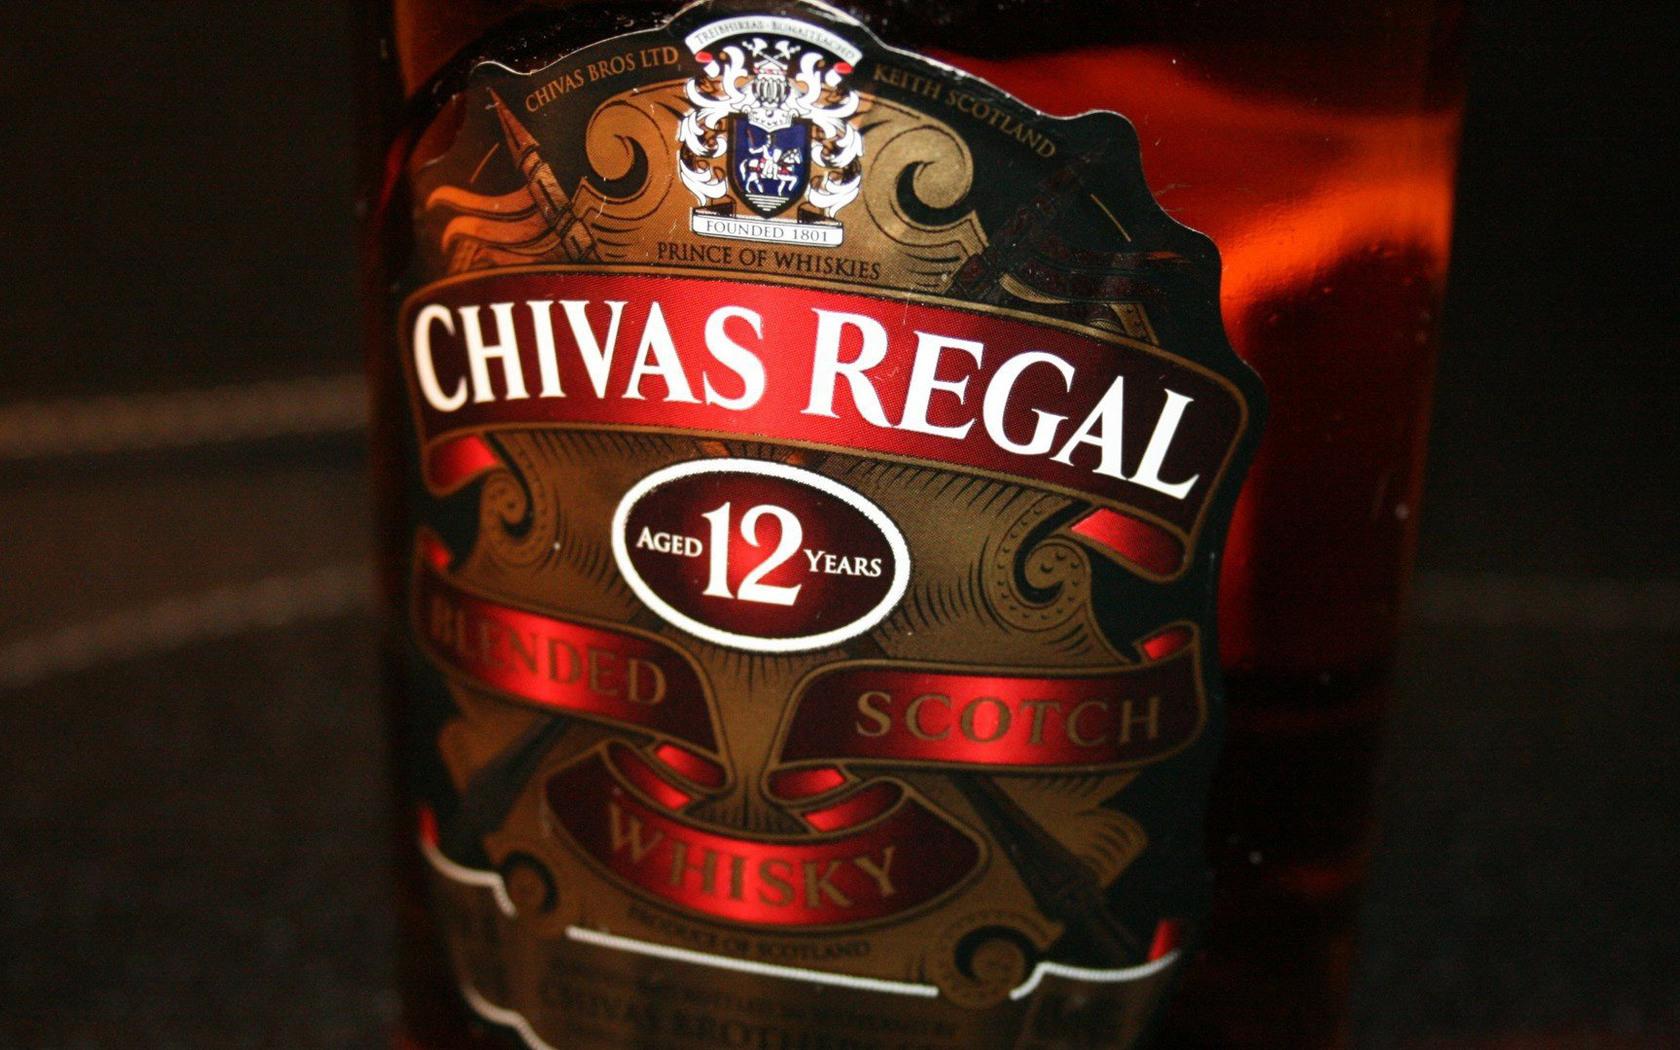 chivas-regal-qhd.jpg